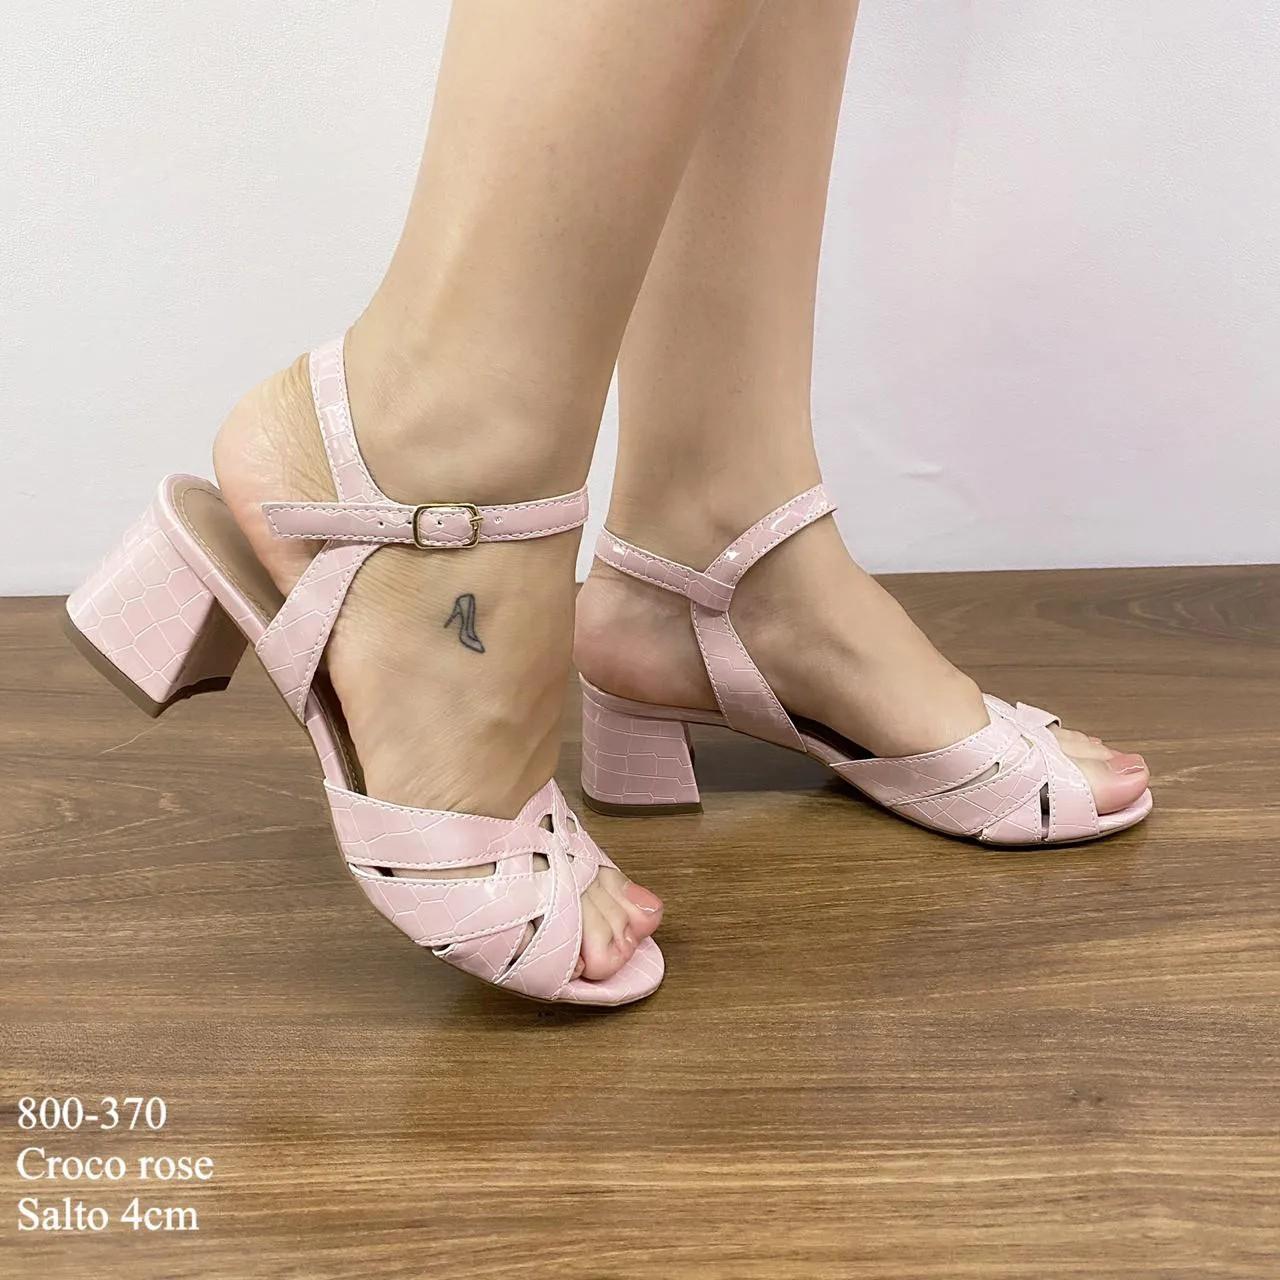 Sandália Rose Croco Salto Bloco   D-800-370